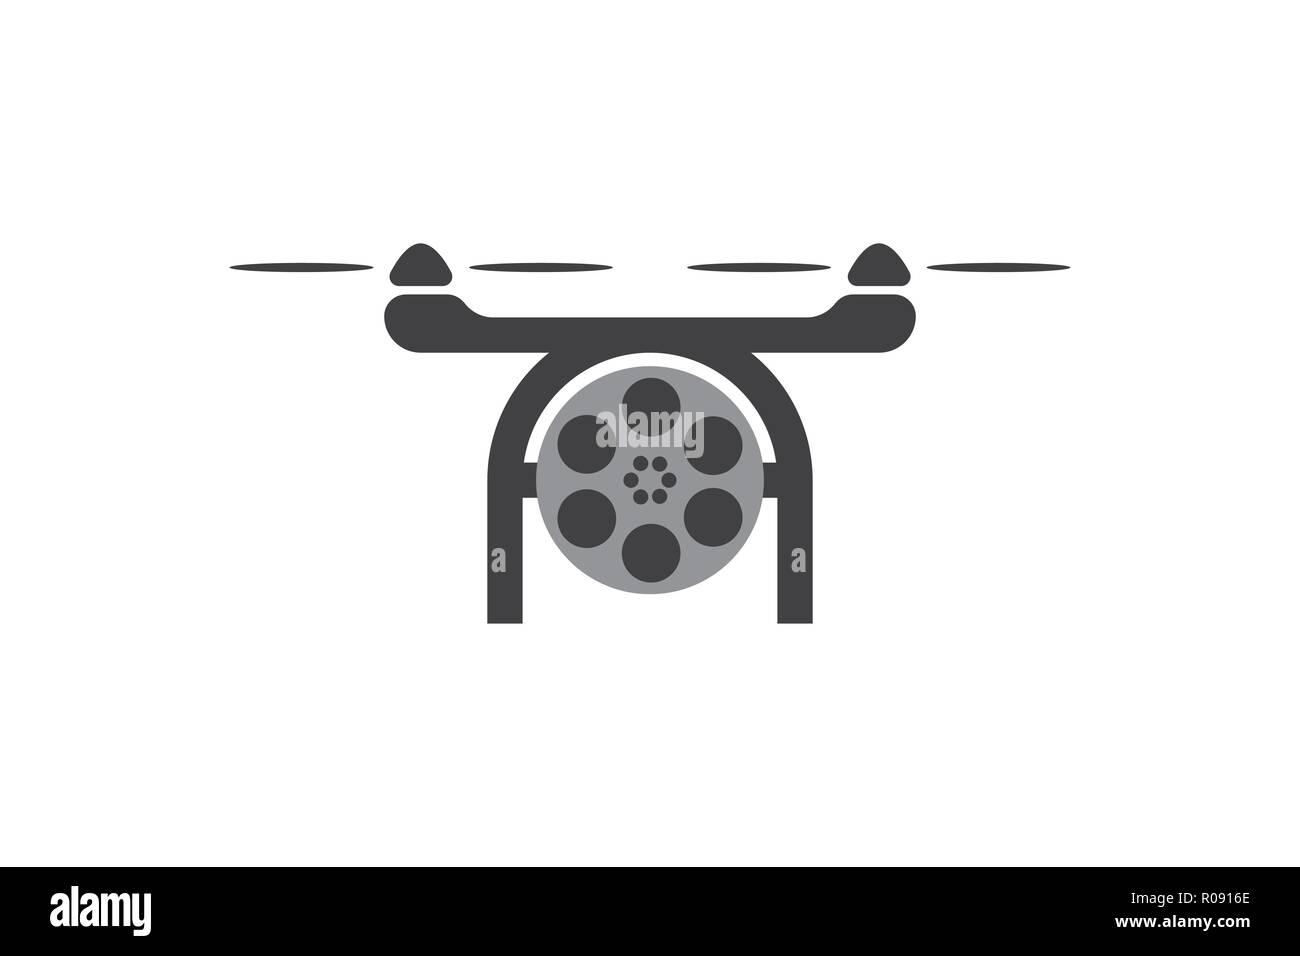 drone, photo logo Designs Inspiration Isolated on White Background - Stock Image